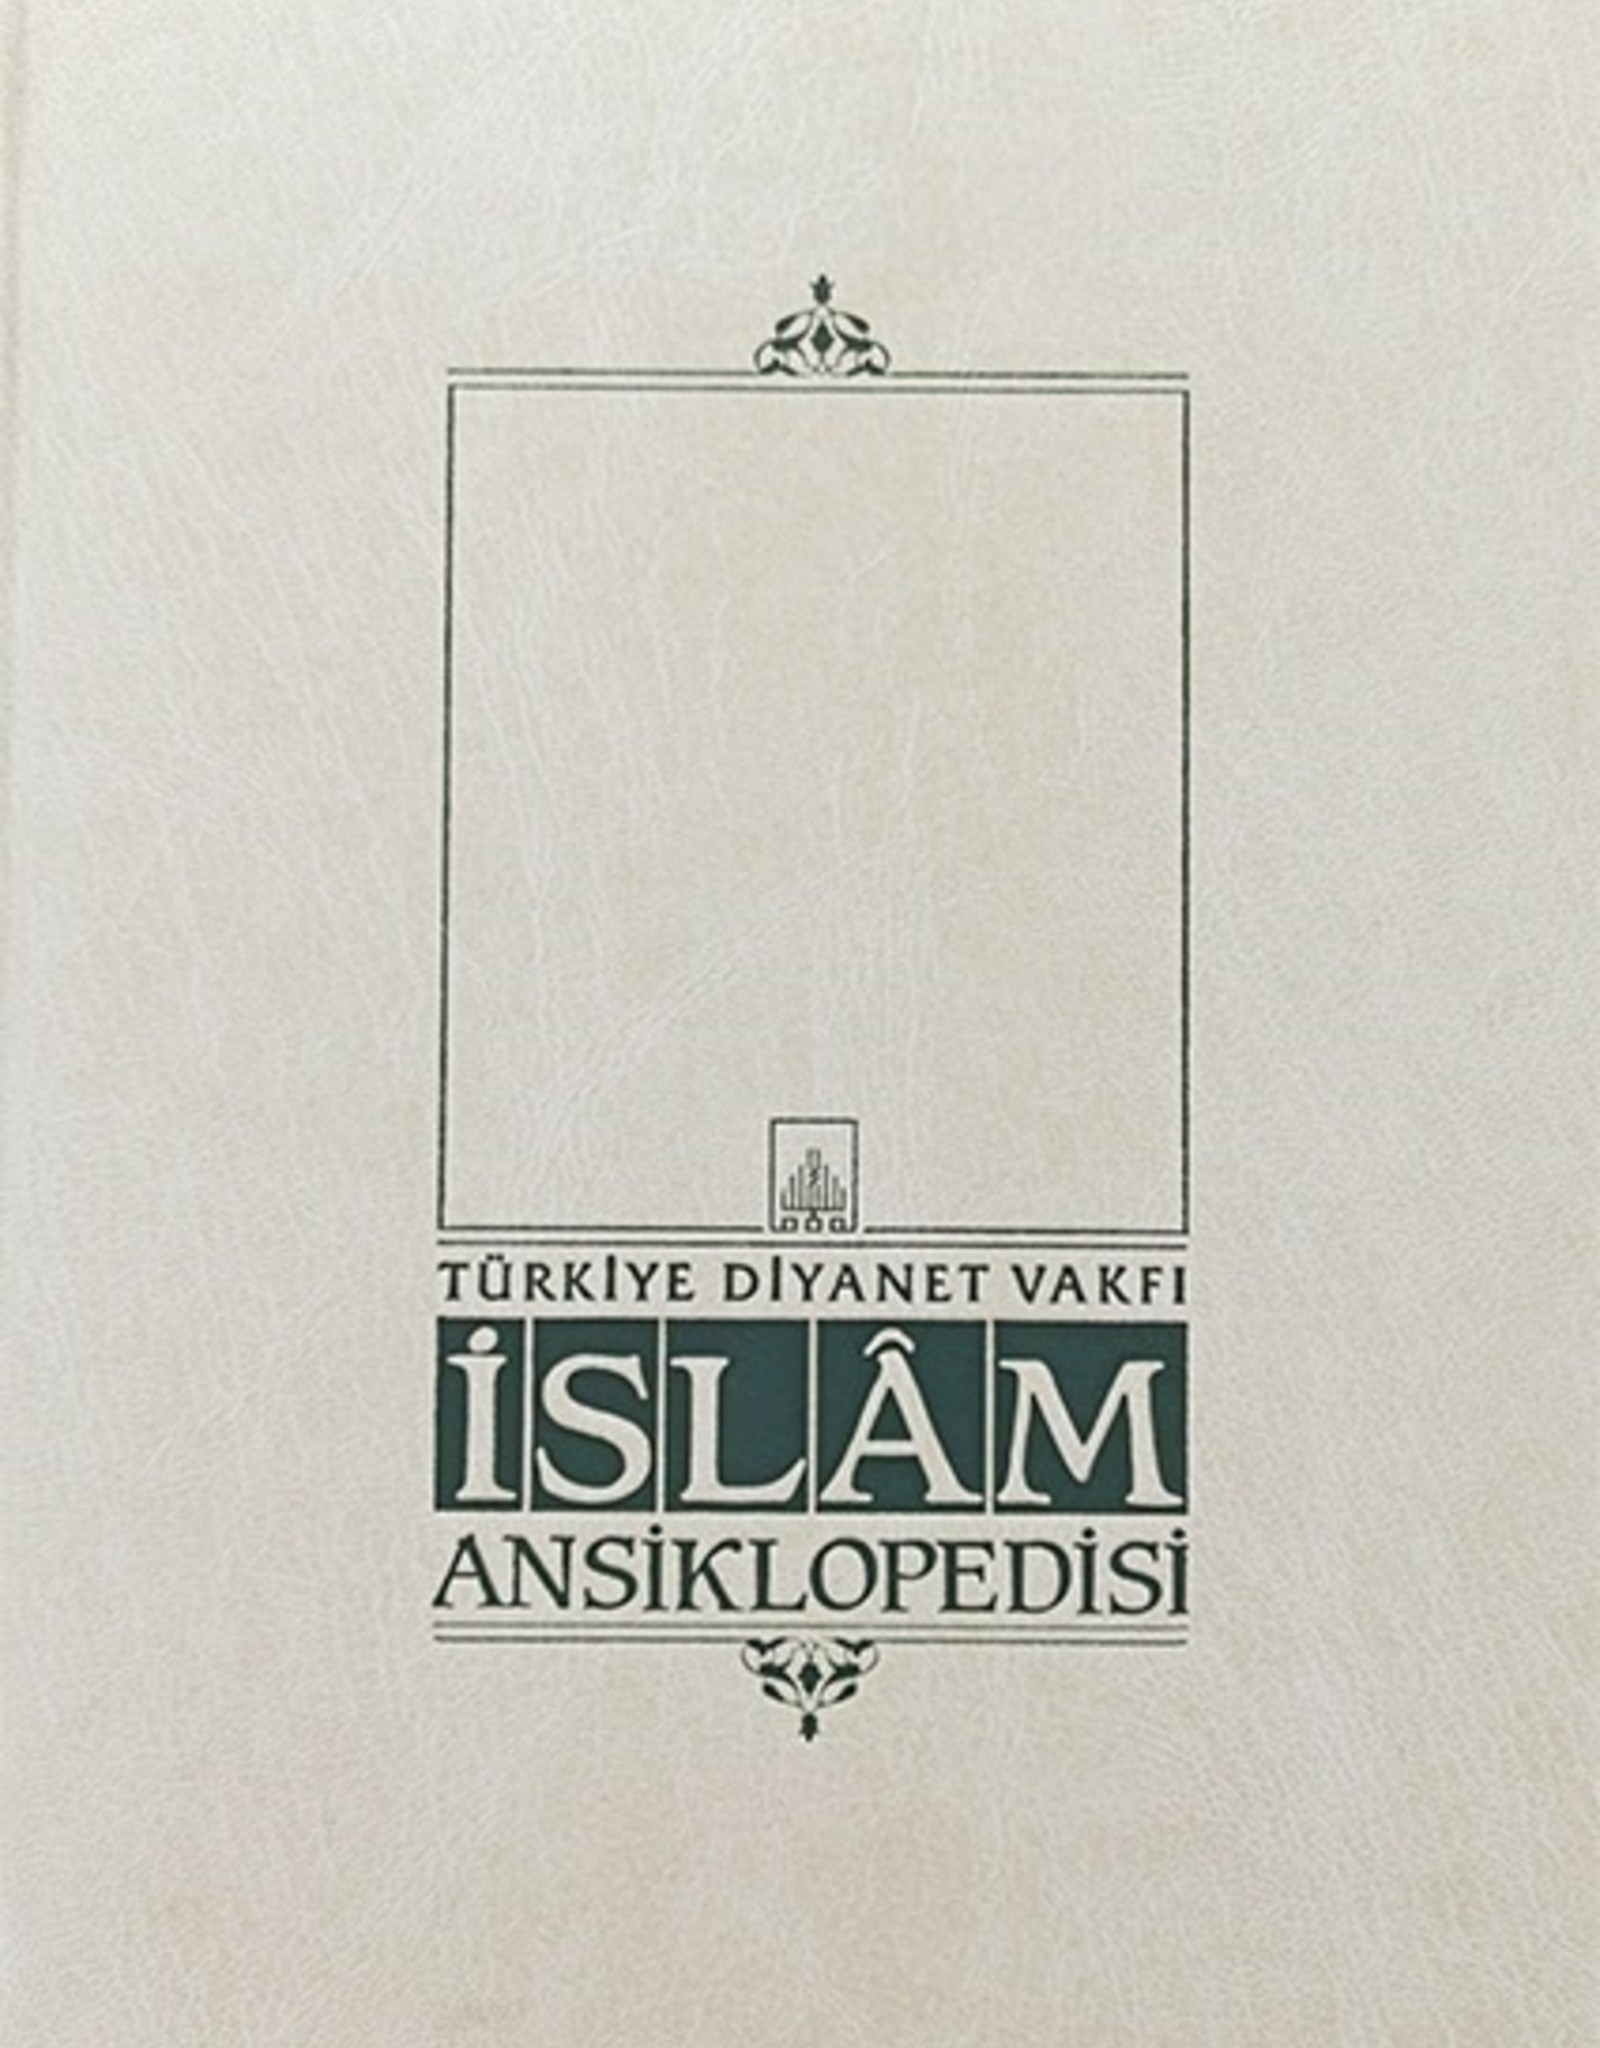 İslam Ansiklopedisi 14. Cilt